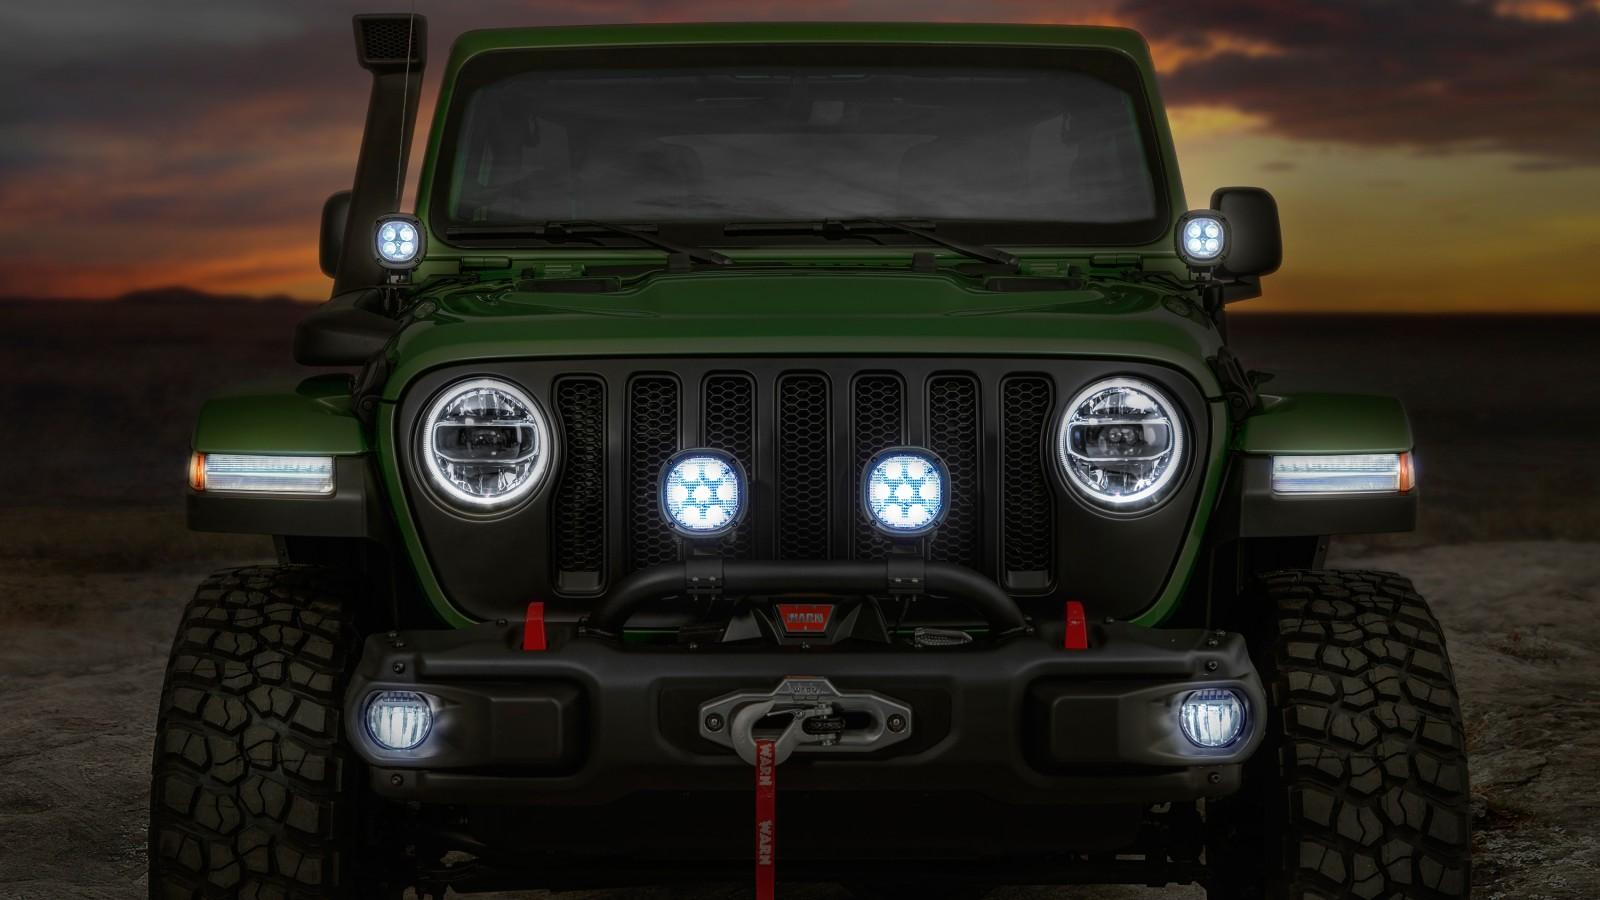 Hummer Car Wallpaper Download 2018 Jeep Wrangler Unlimited Rubicon Moparized 2 Wallpaper